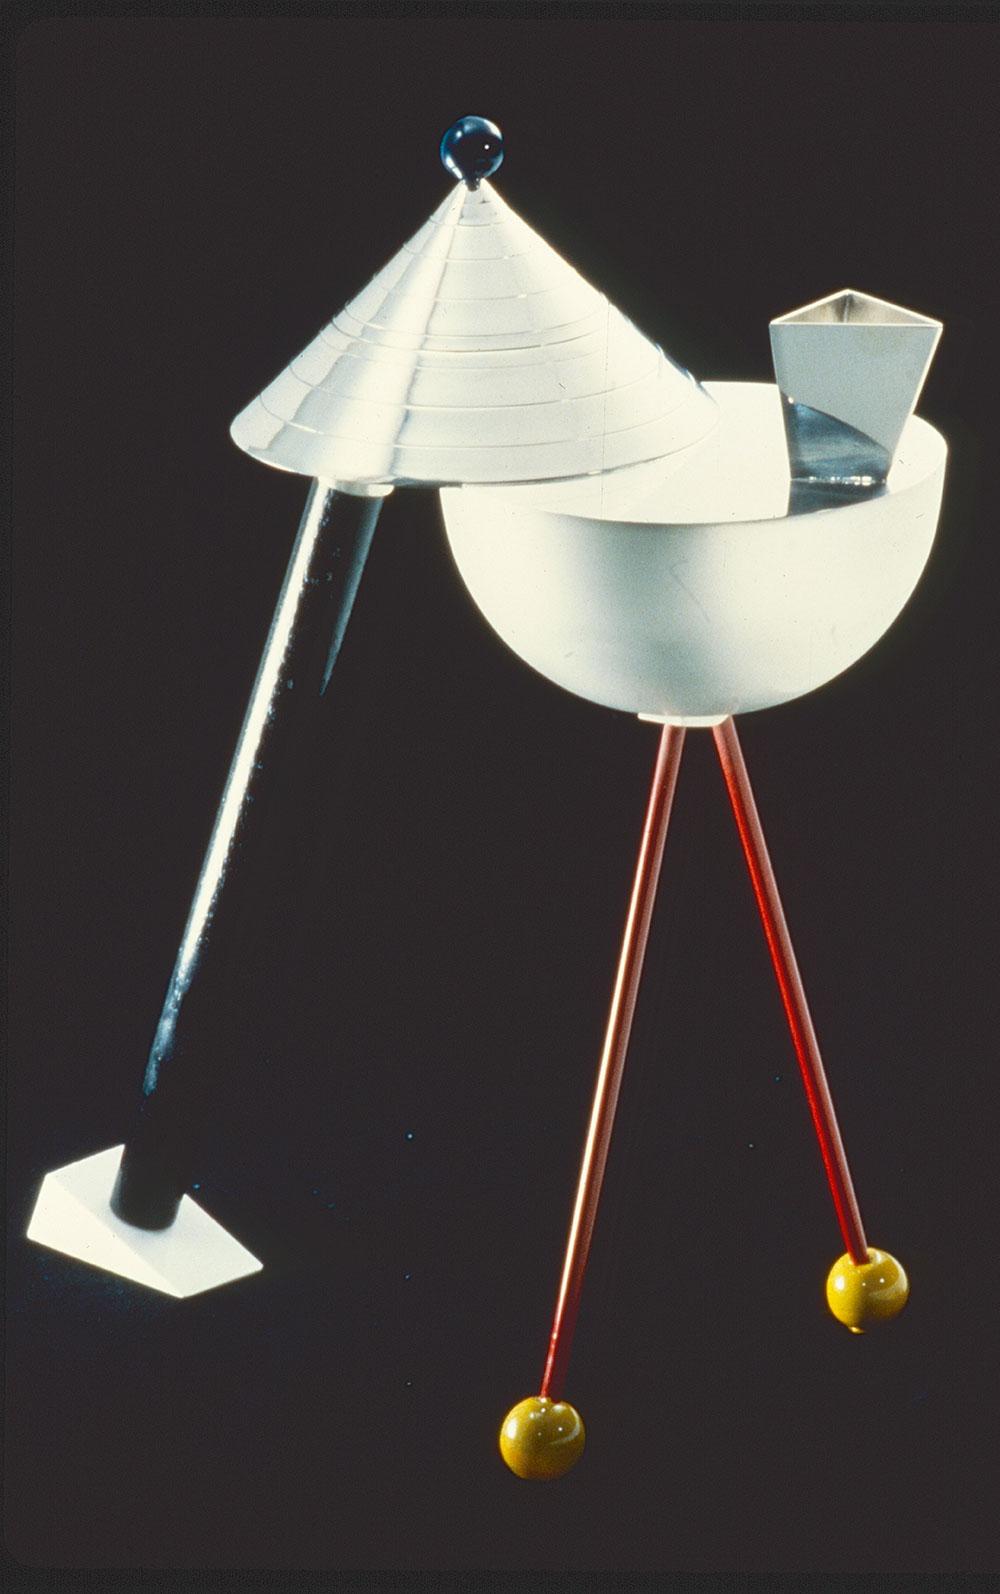 memphis peter shire. Black Bedroom Furniture Sets. Home Design Ideas